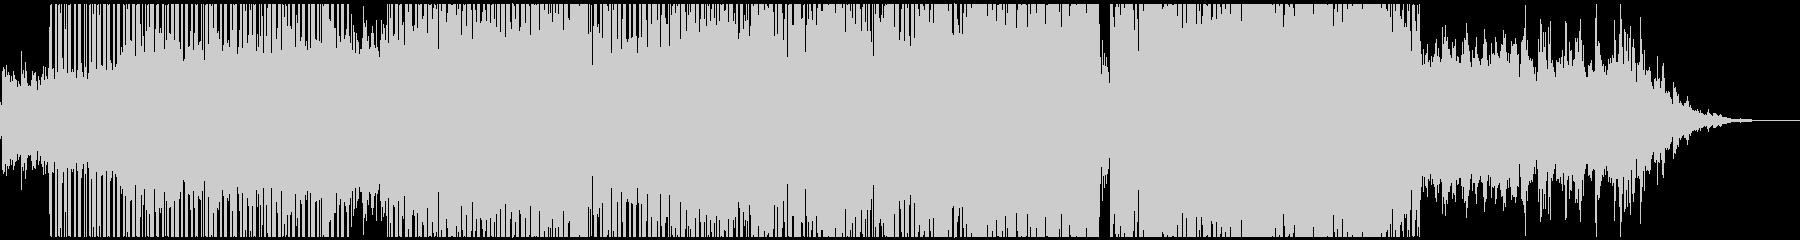 DAYBREAKの未再生の波形